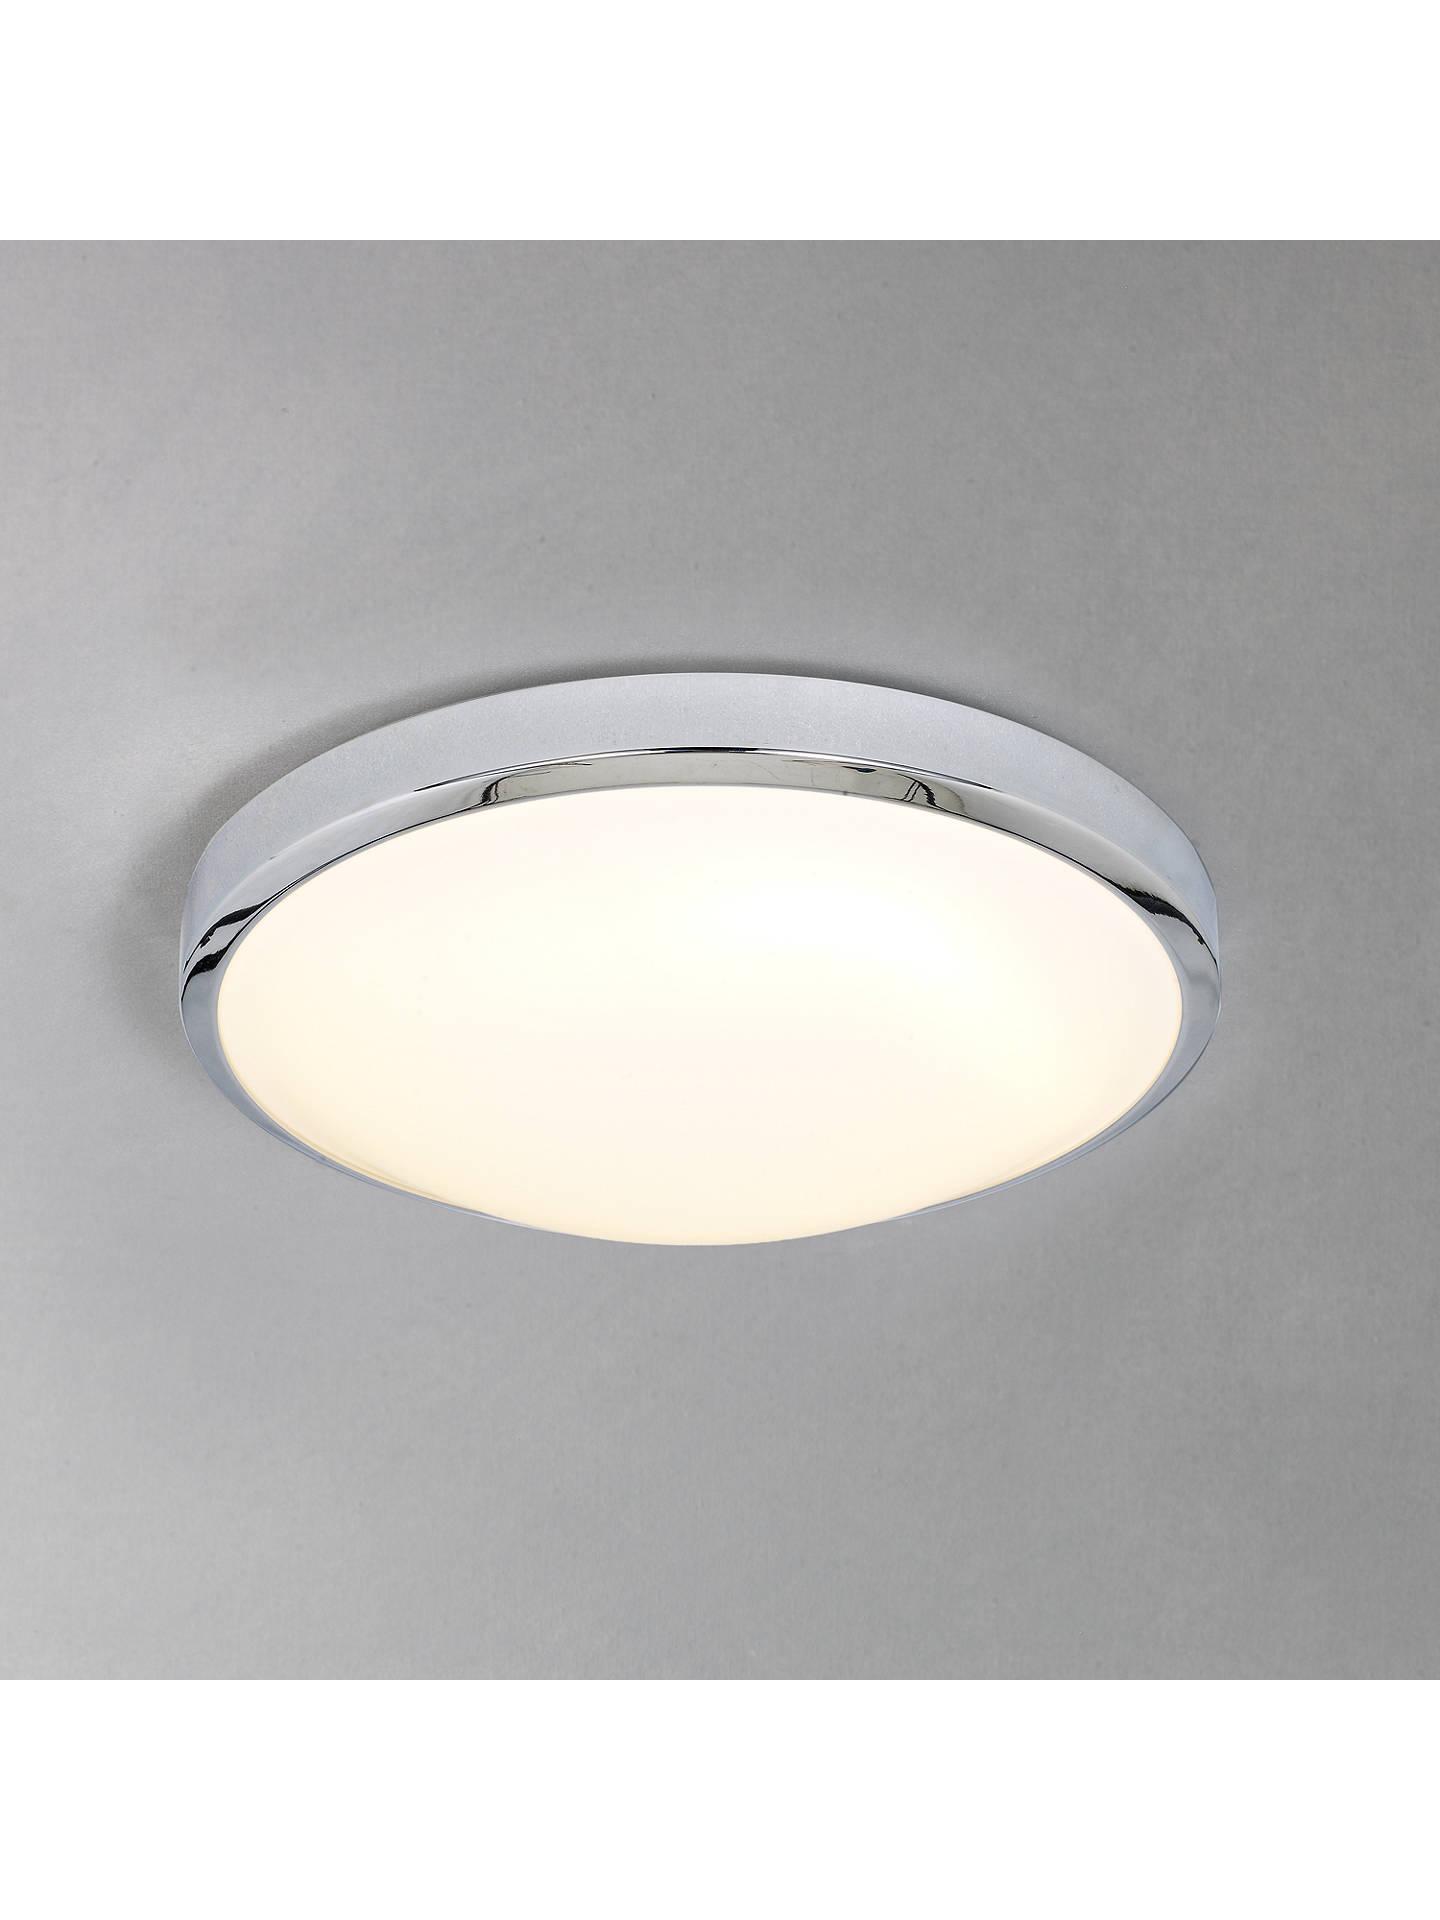 Astro Osaka Energy Saving Bathroom Light At John Lewis